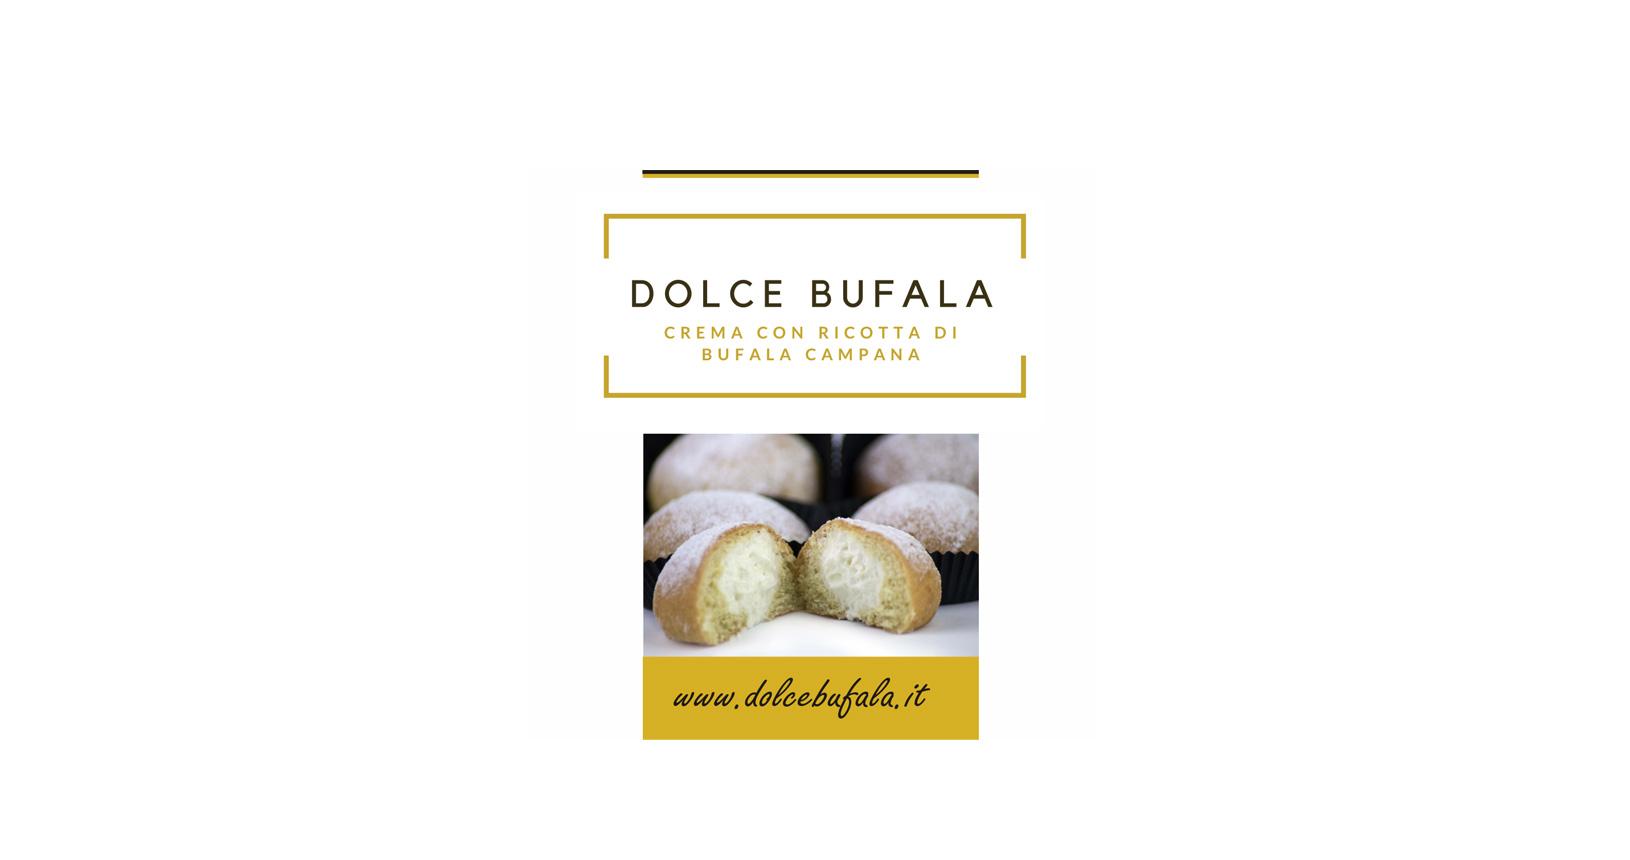 Dolce Bufala